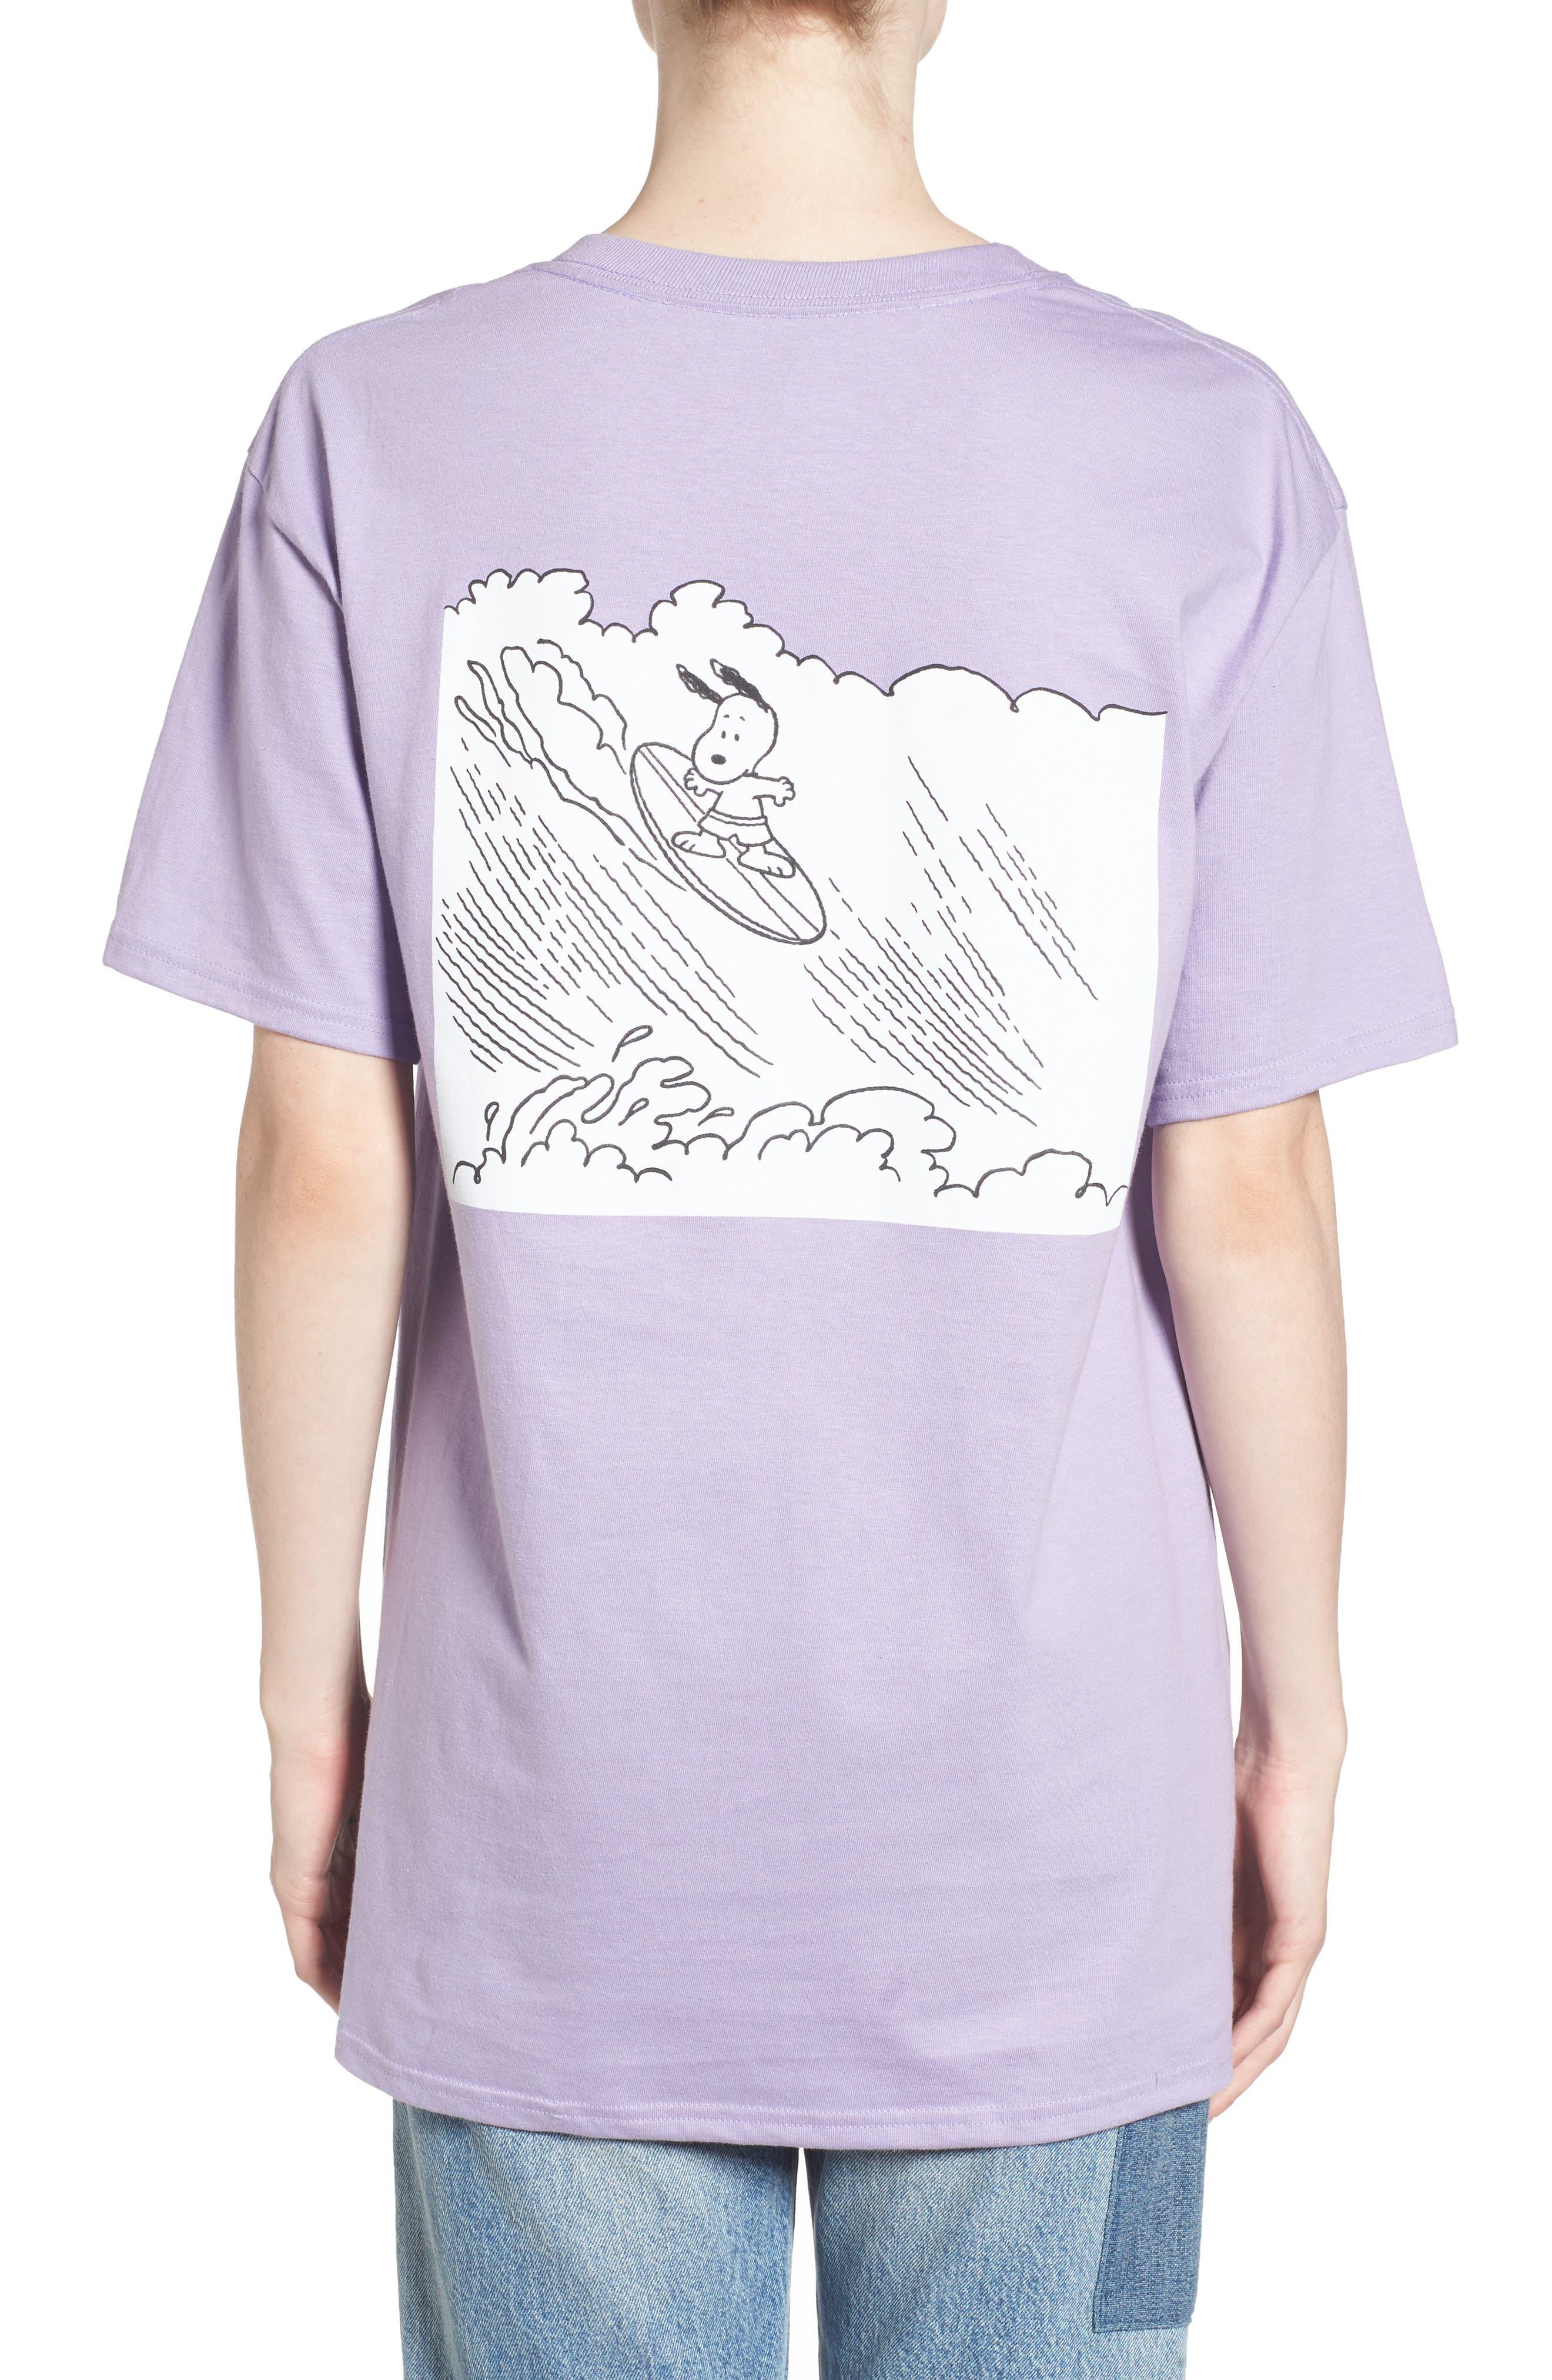 Peanuts Snoopy Surf T-Shirt,                             Alternate thumbnail 3, color,                             510